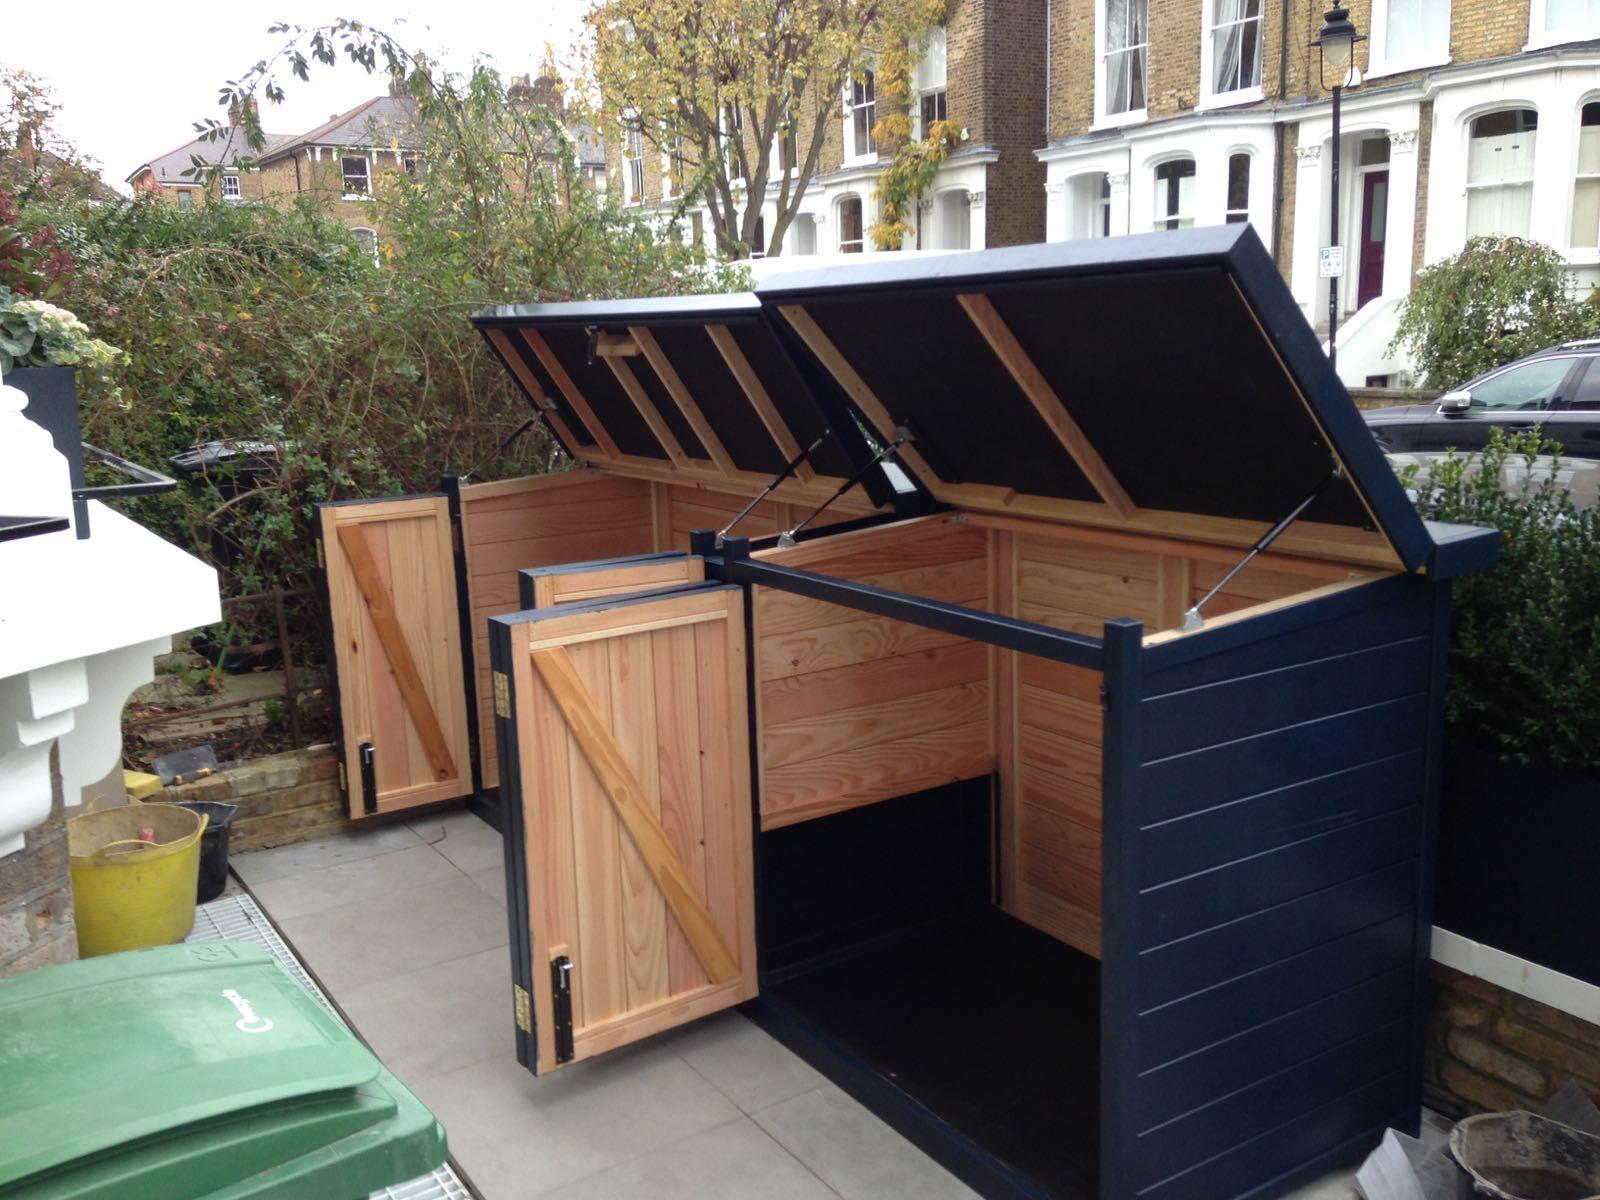 Bespoke storage with concertina door to save space.  Patio